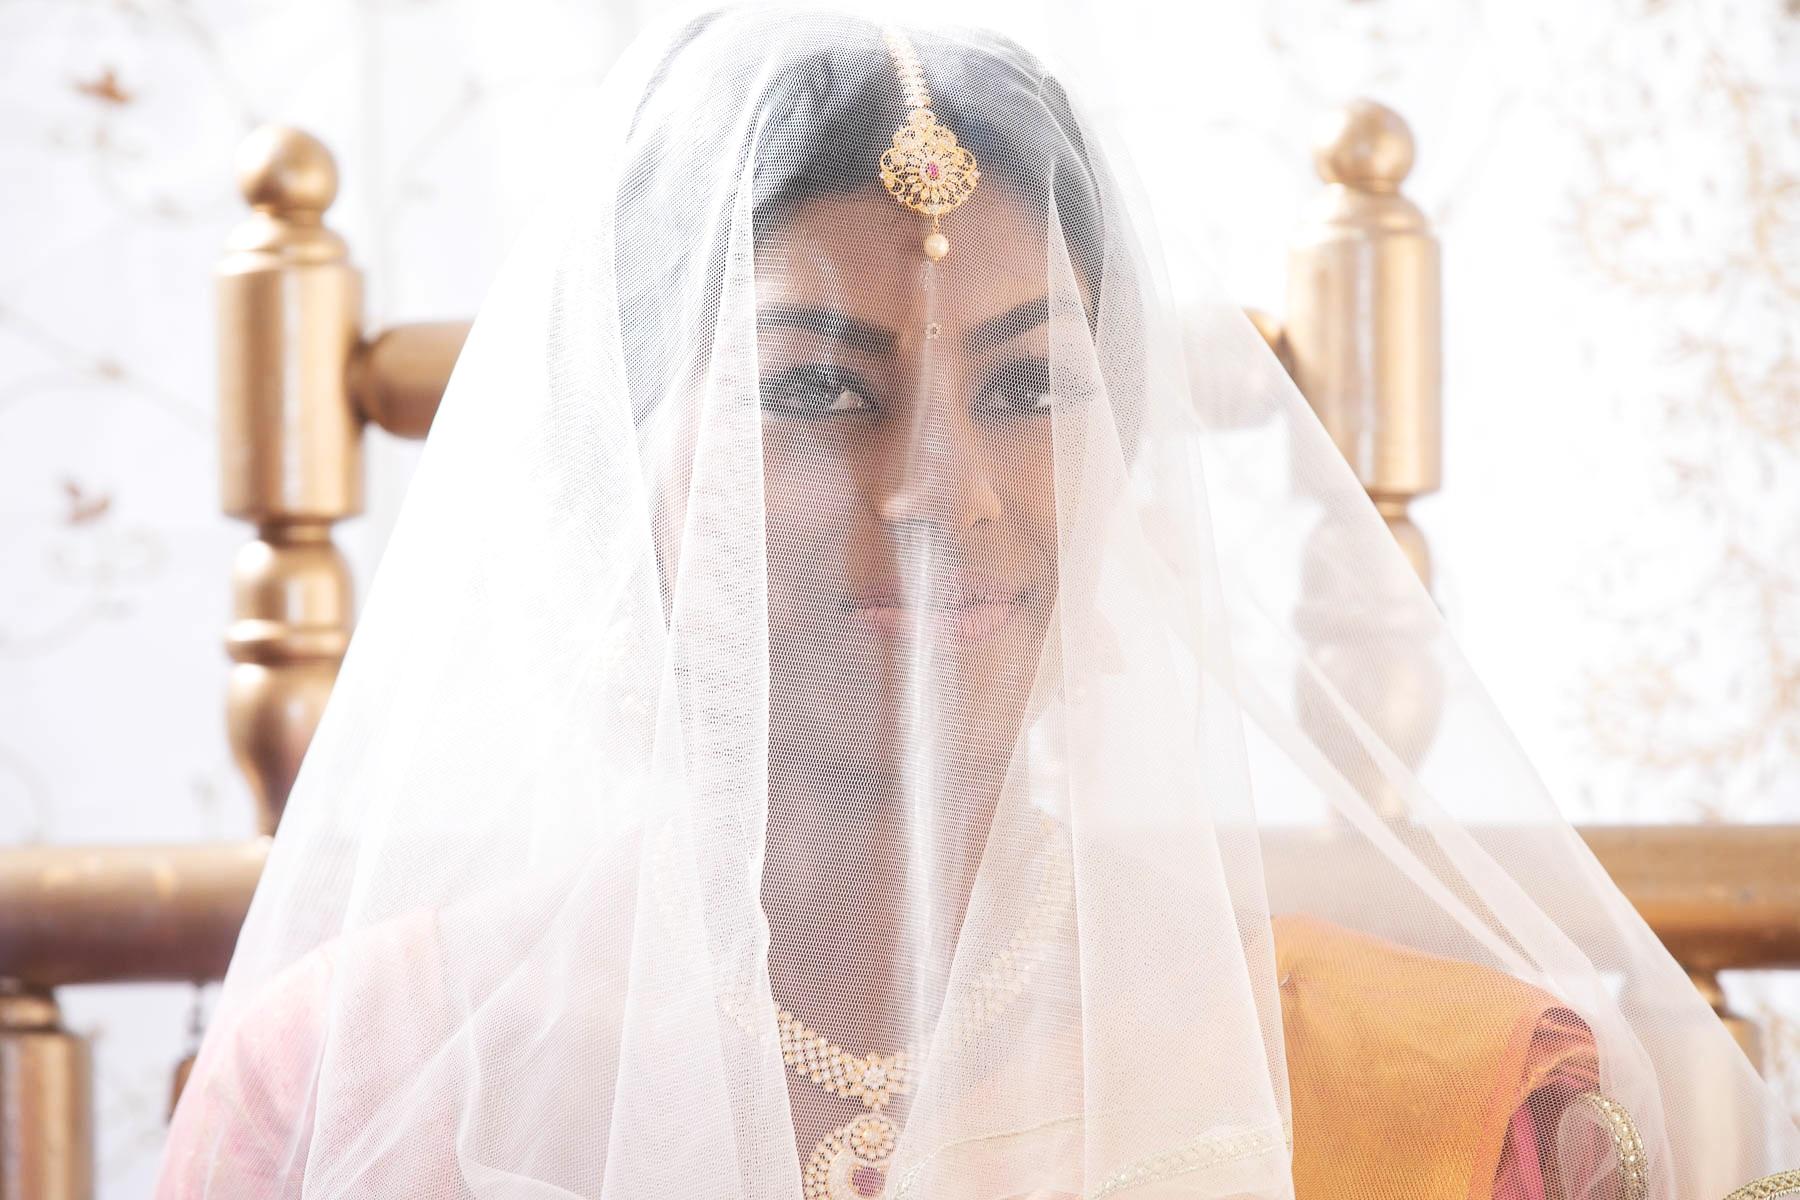 Addington-Palace-Tamil-wedding-photographer-surrey-london-natalia-smith-photography-0009.jpg